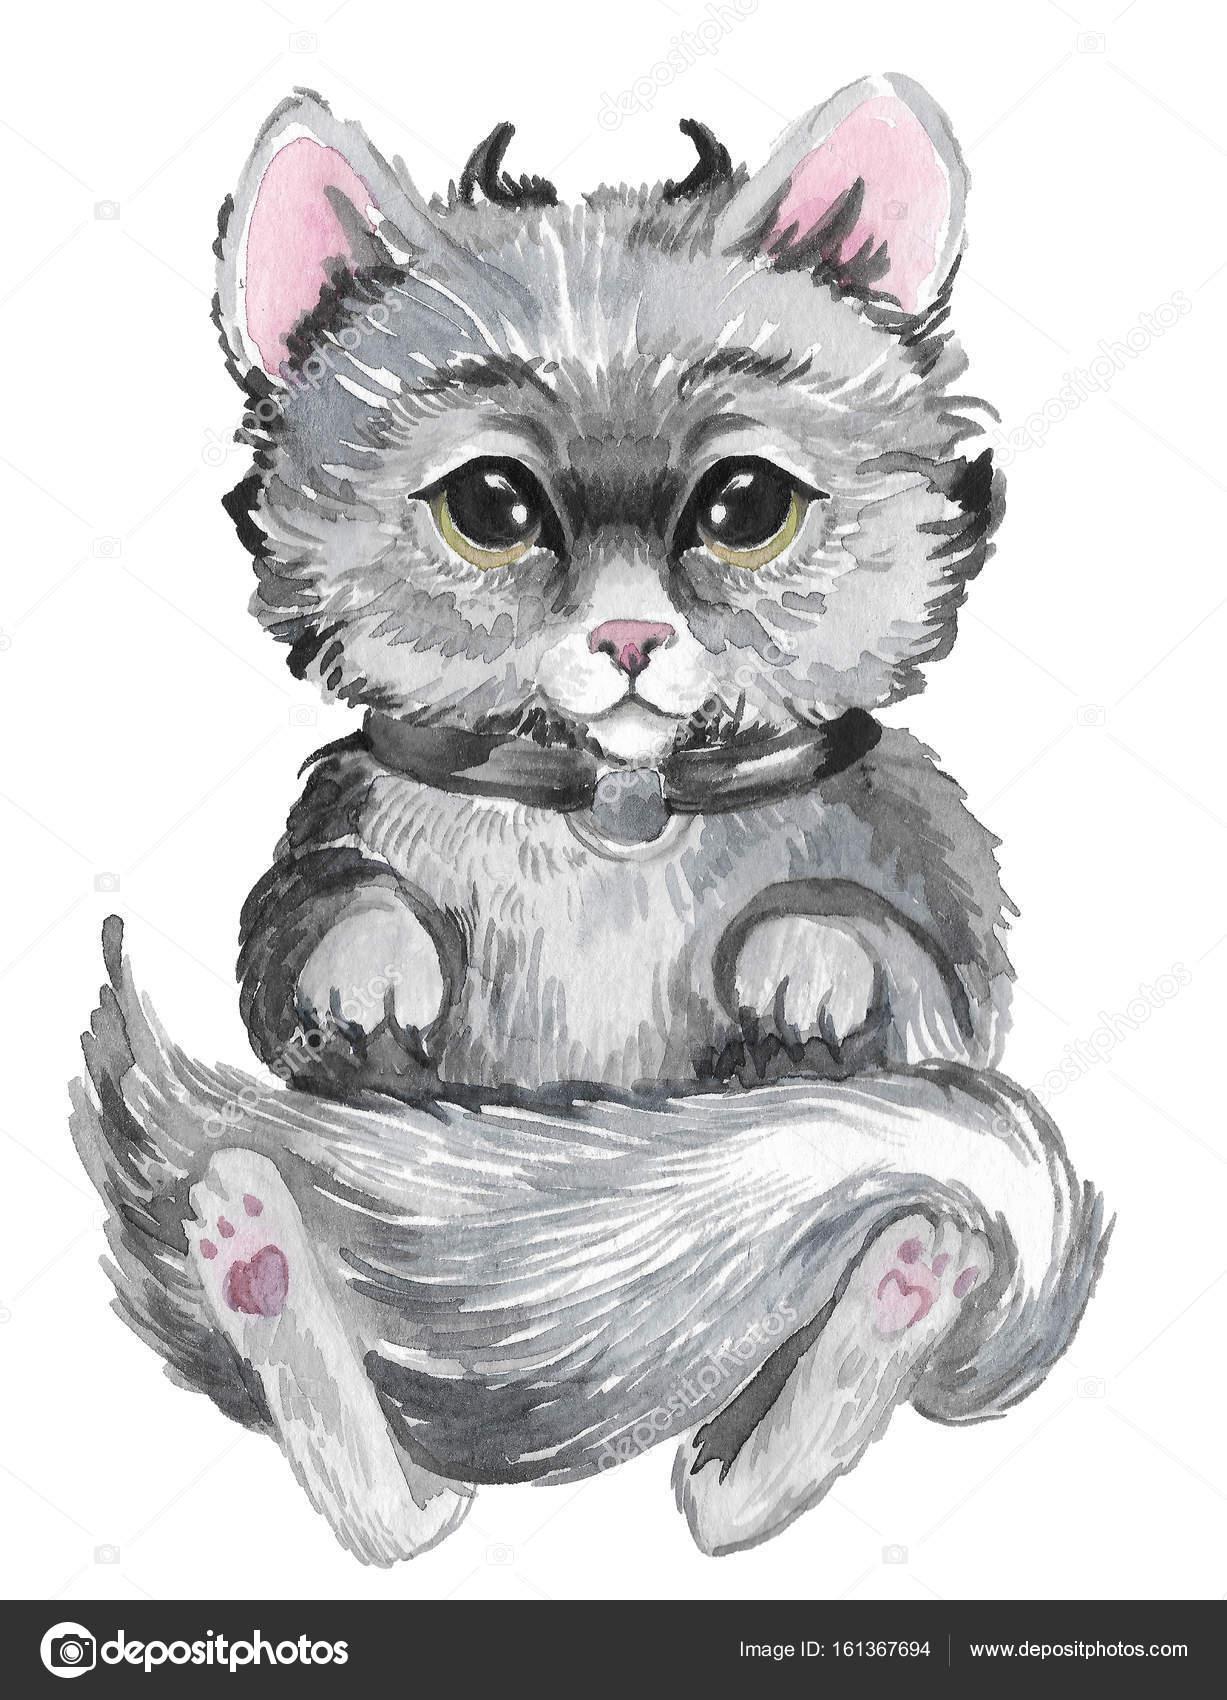 Süße Katze in Aquarell gemalt — Stockfoto © YuliaRey #161367694